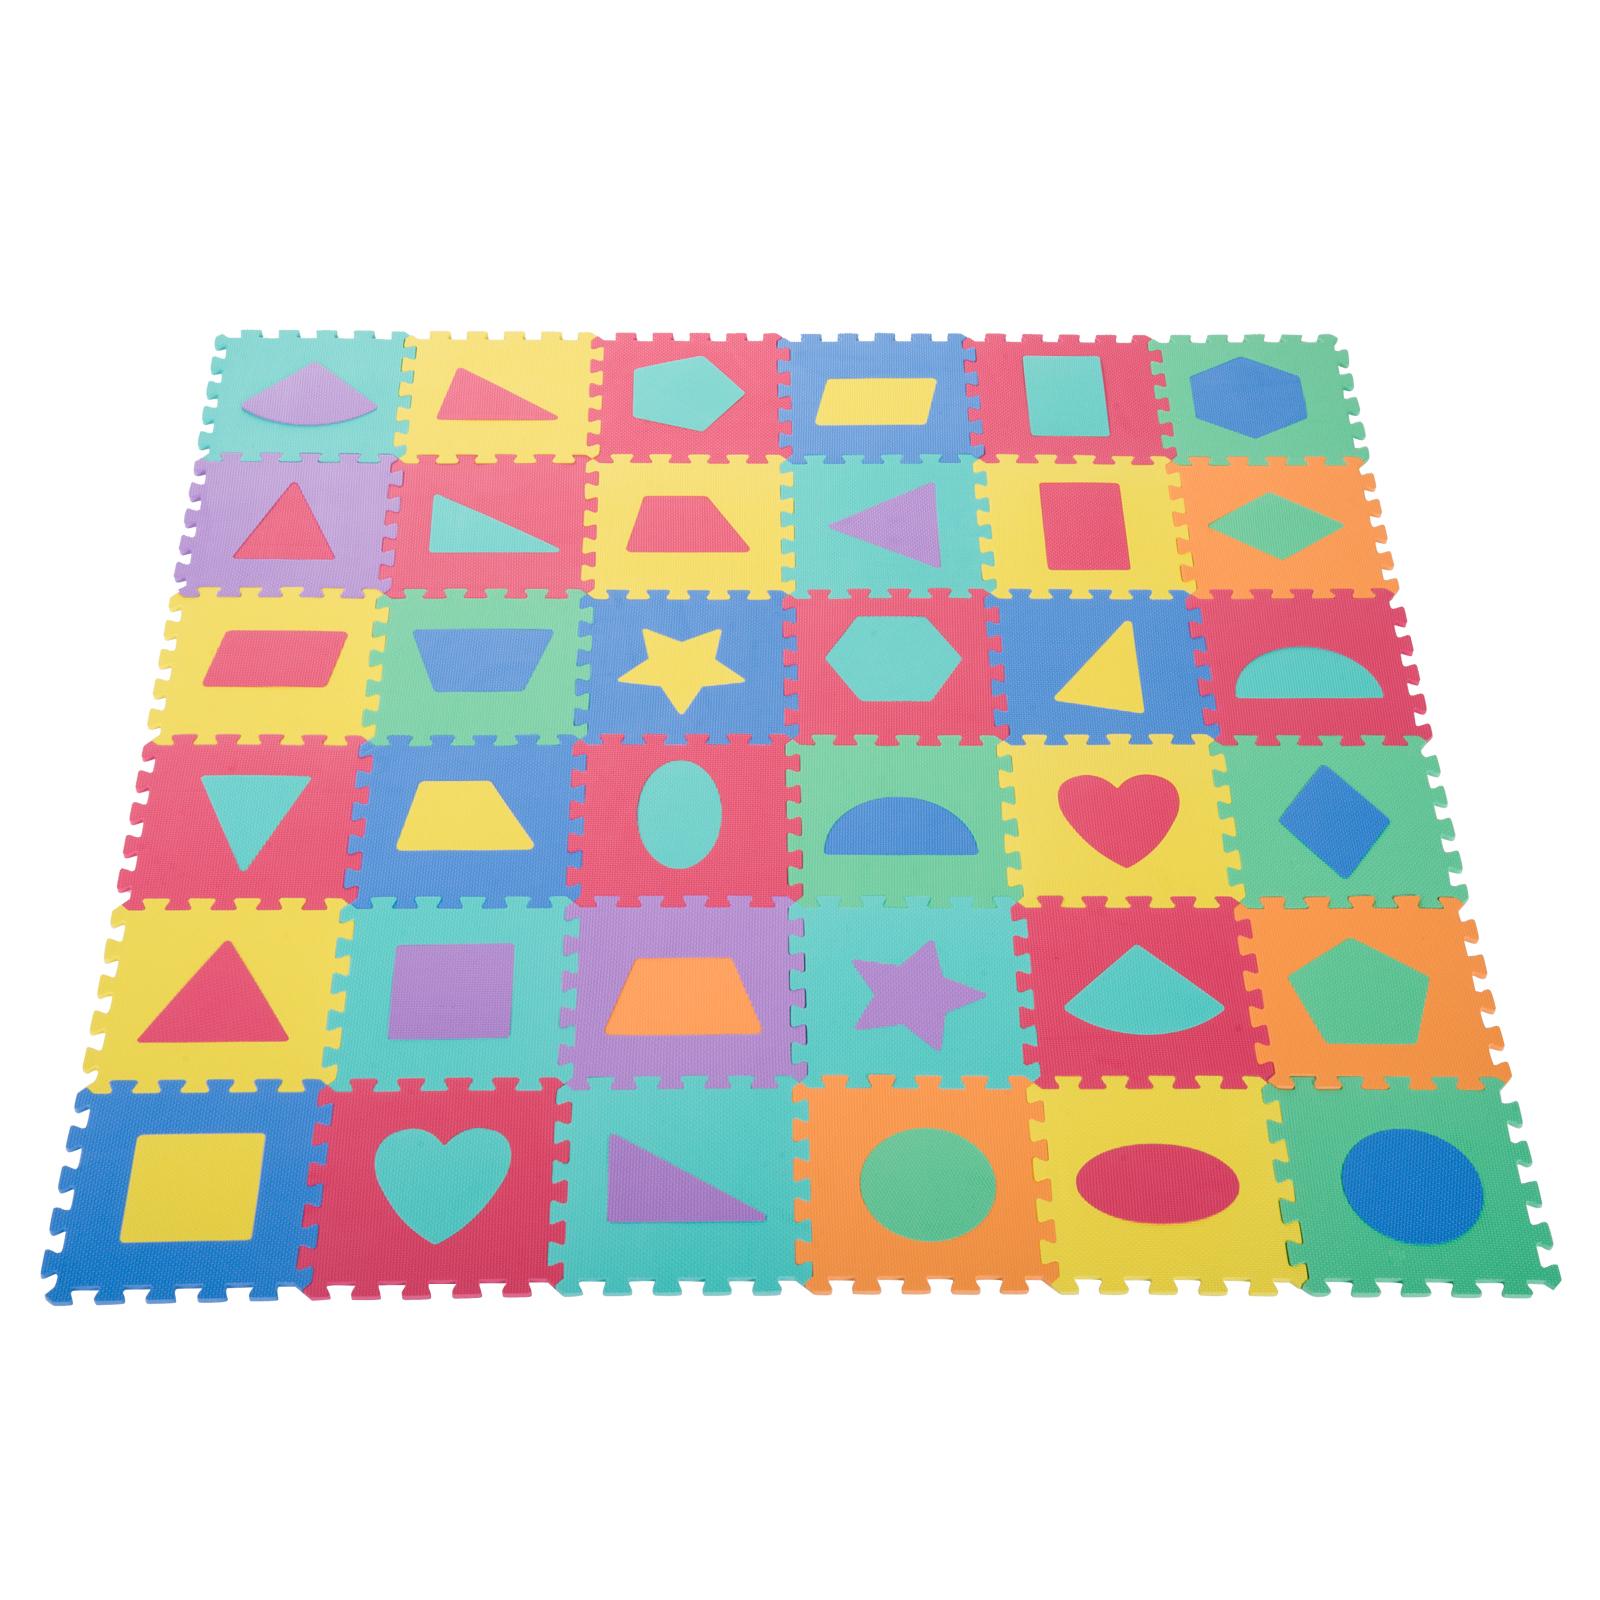 Homcom Covor Puzzle cu Forme Geometrice 36 Bucati 31x31cm, Colorat imagine aosom.ro